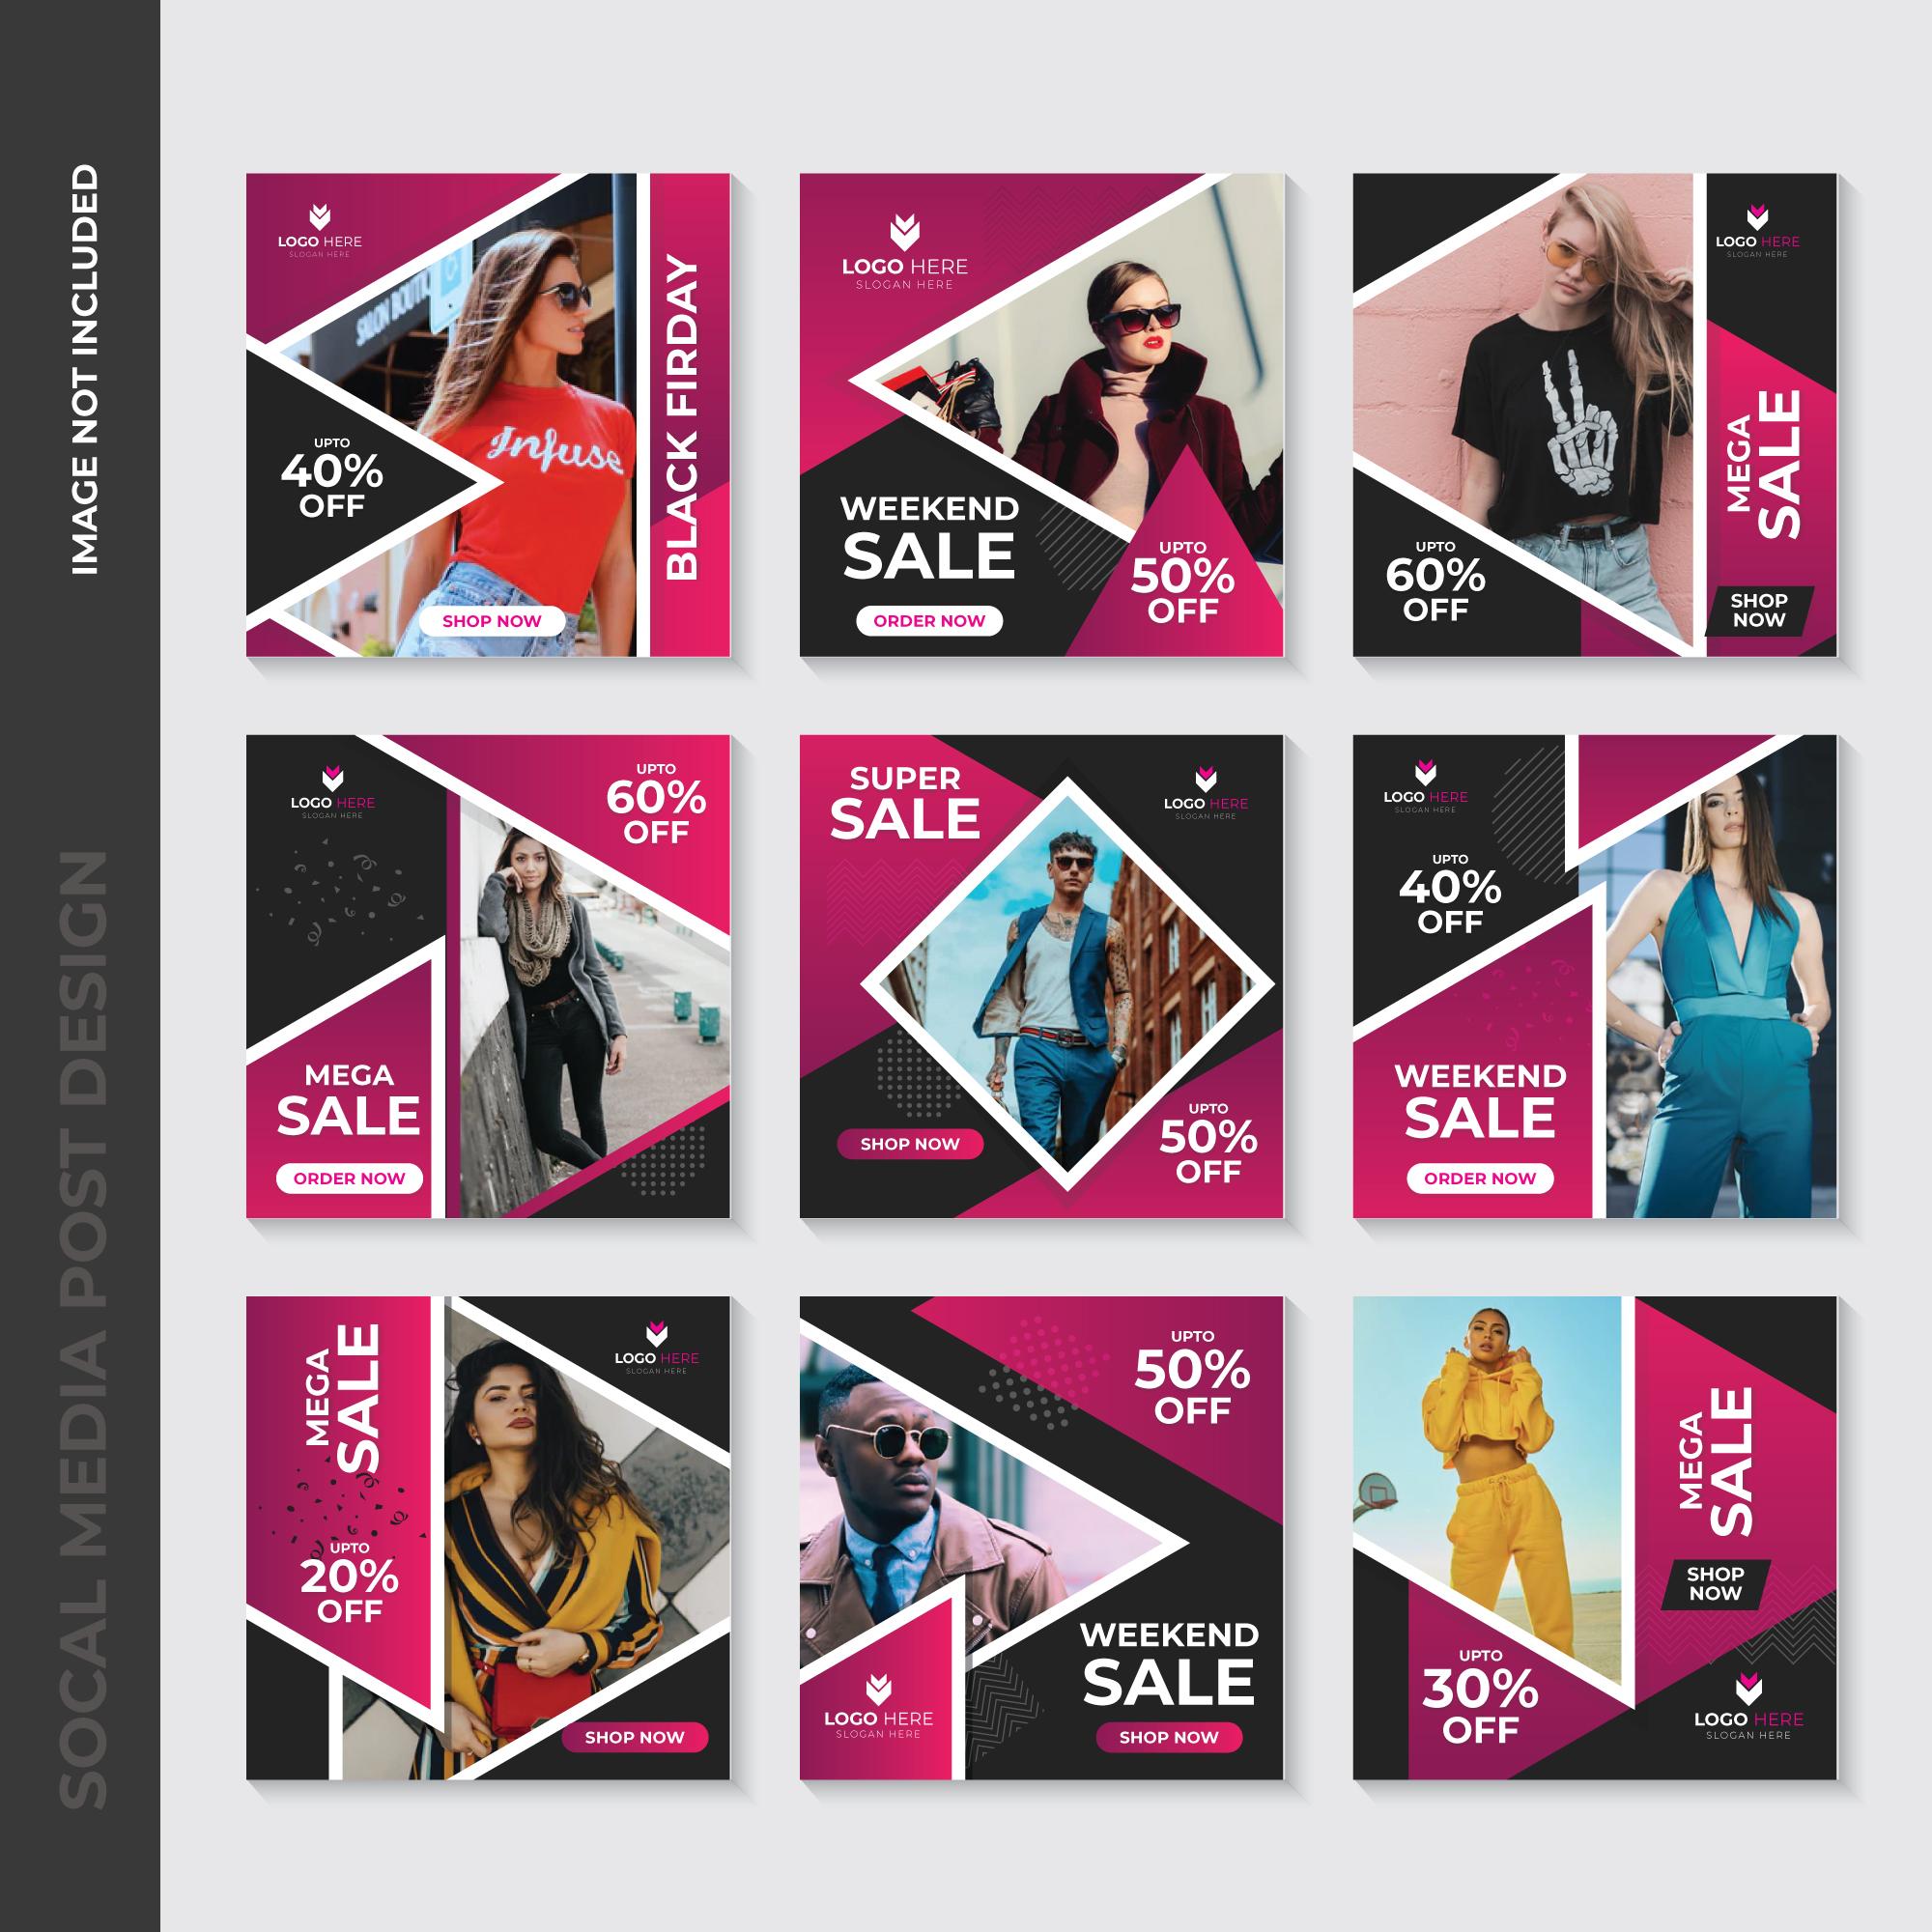 Pink Geometric Fashion Social Media Post Template Design Download Free Vectors Clipart Graphics Vector Art